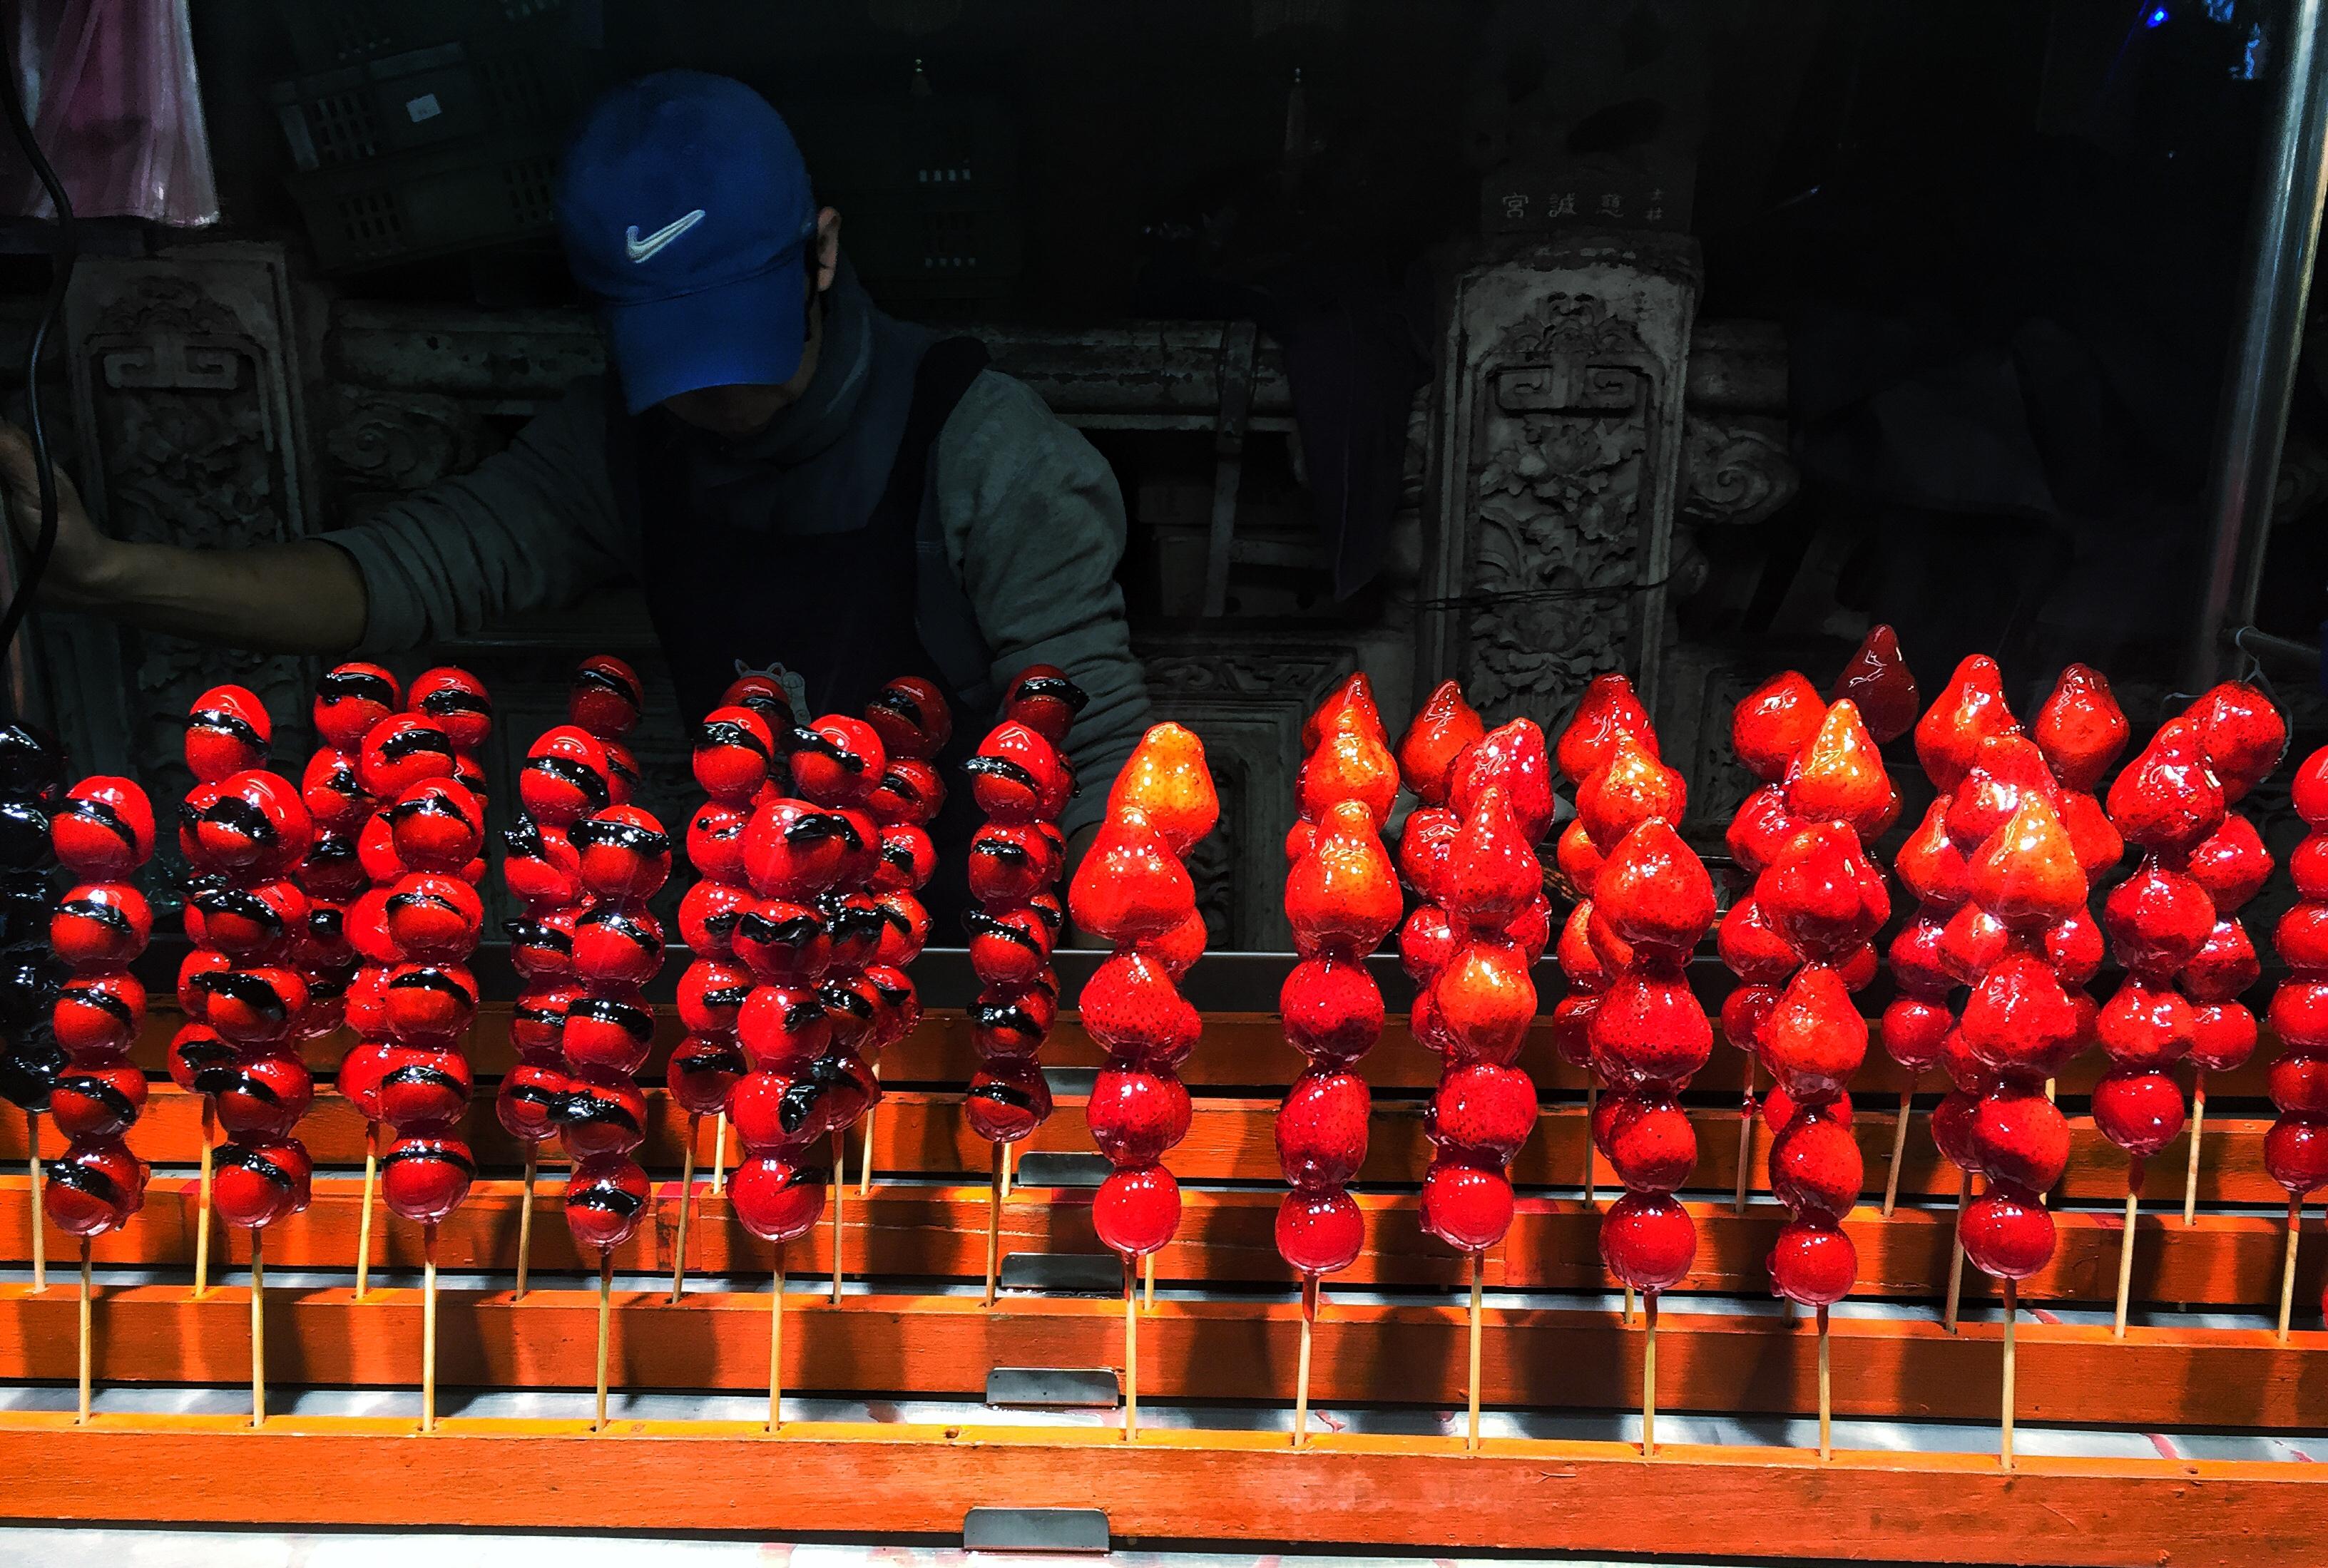 SHILIN NIGHT MARKET Taipei candied tomatoes